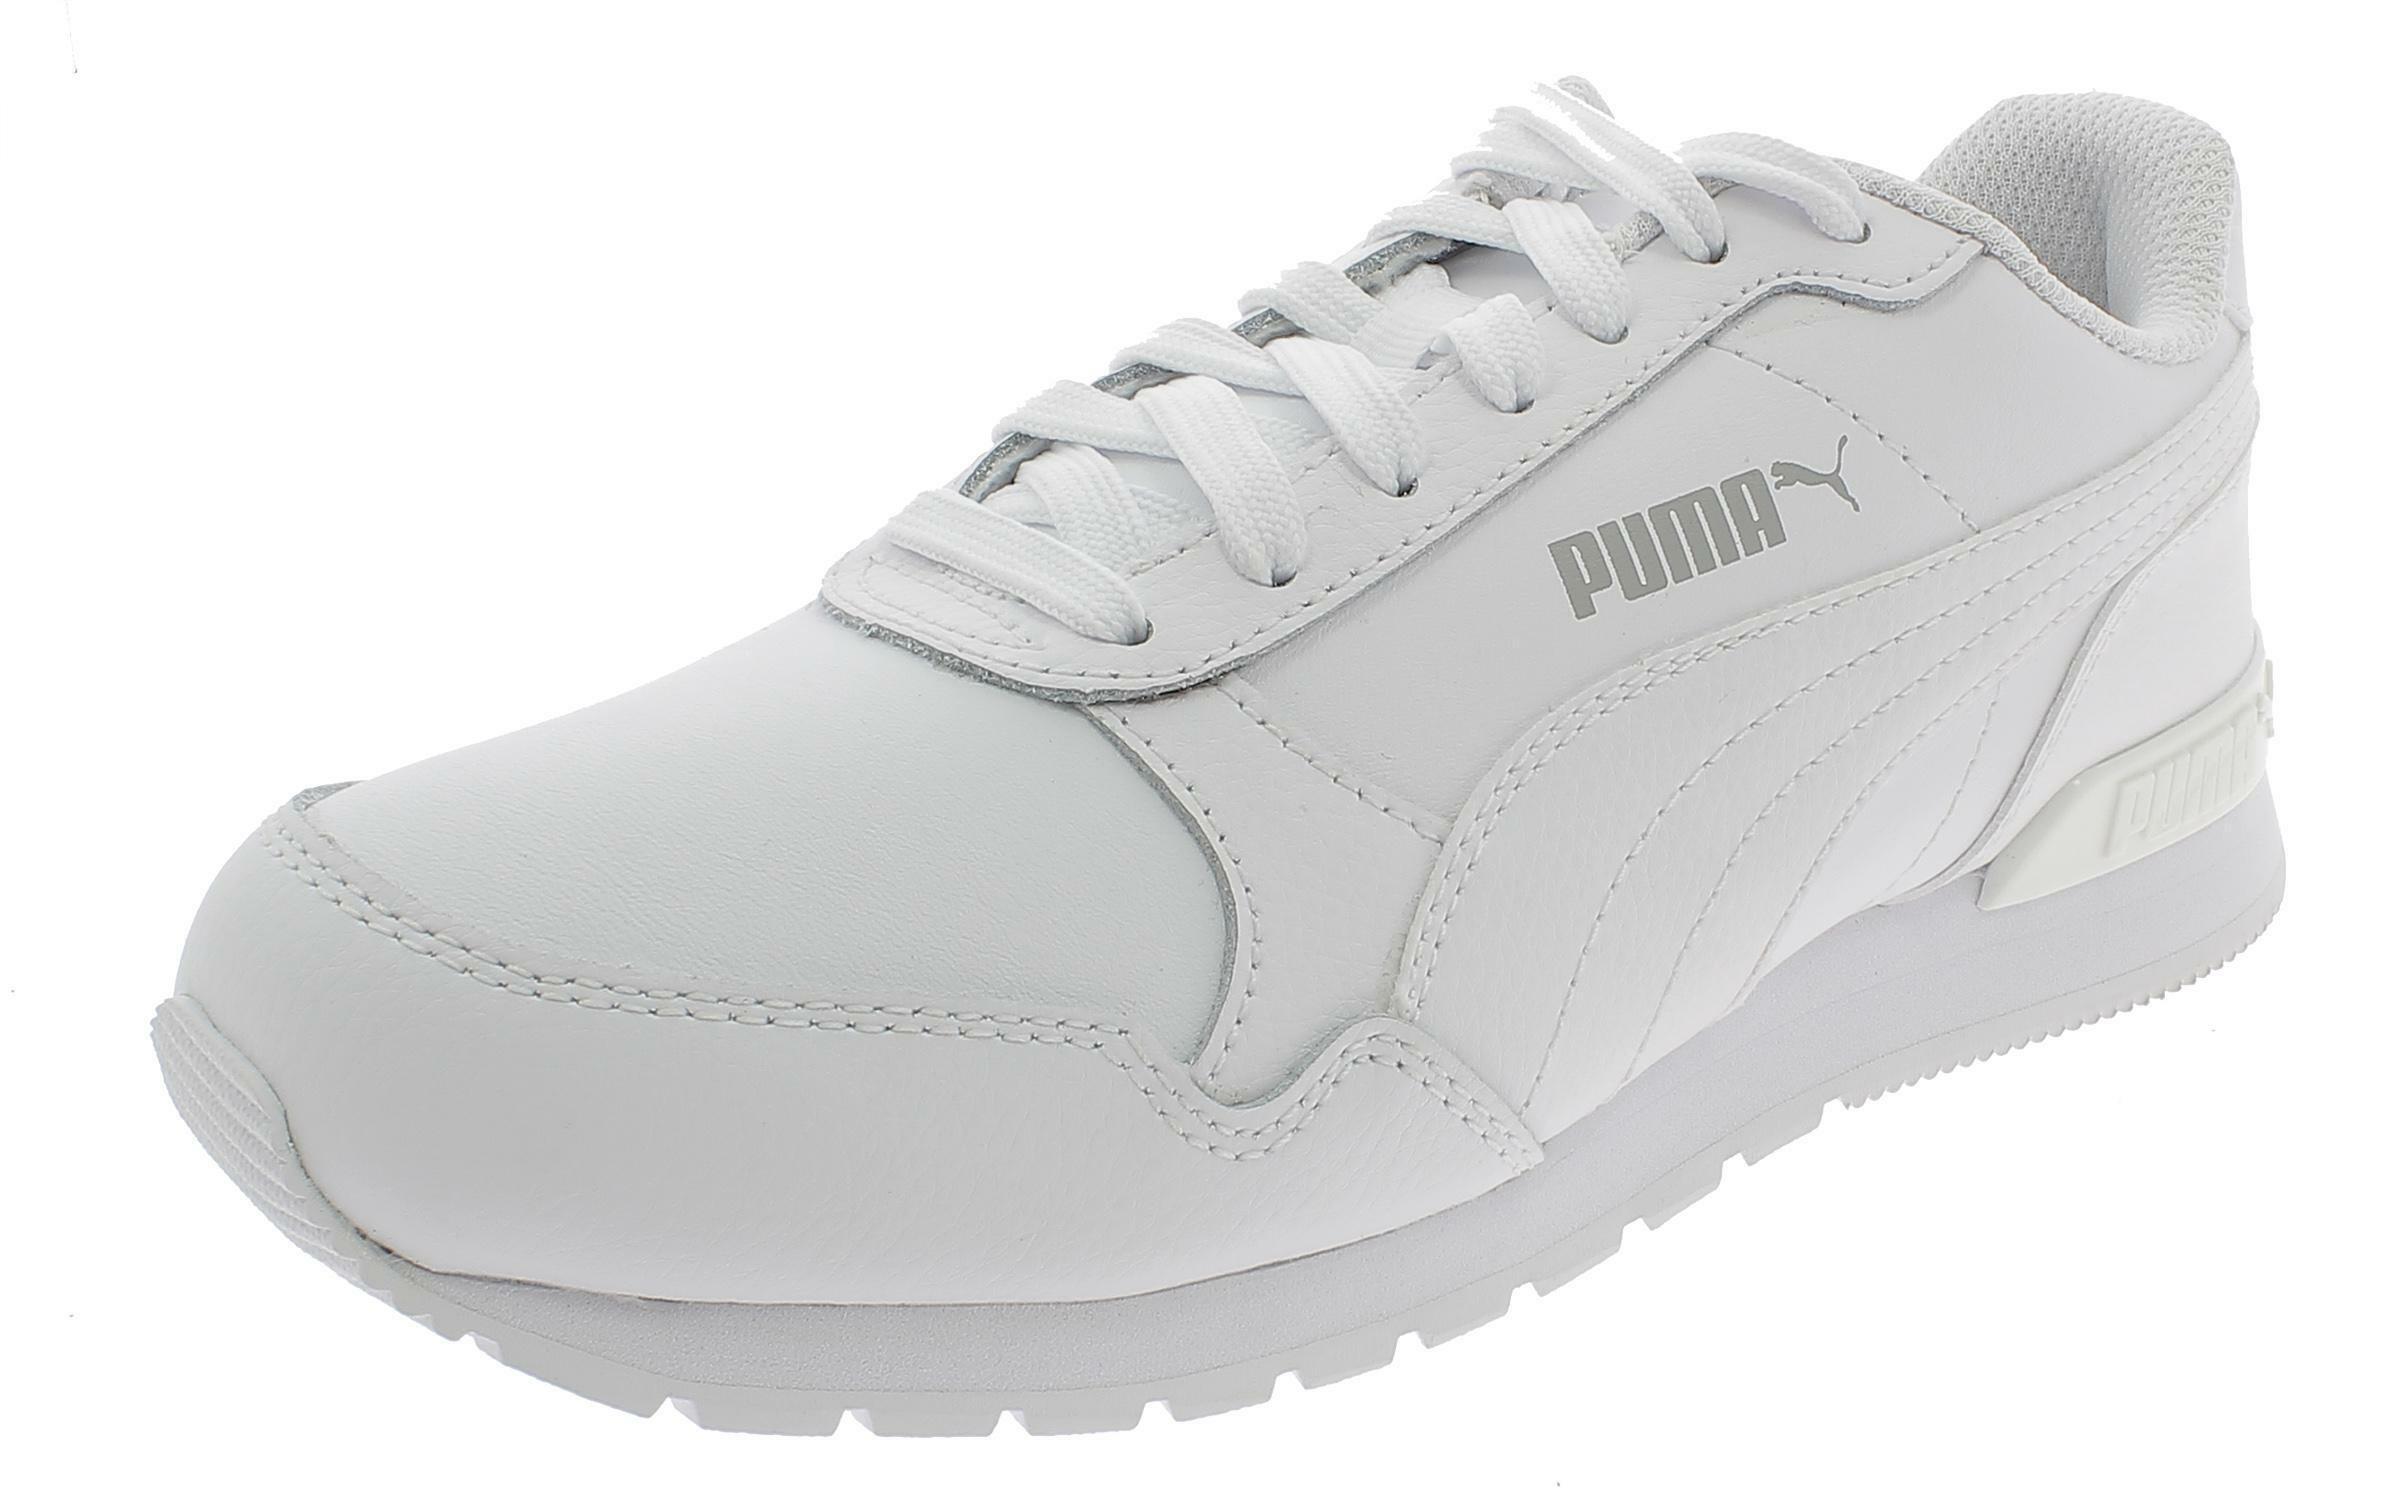 Puma st runner v2 scarpe sportive donna bianche 36695902